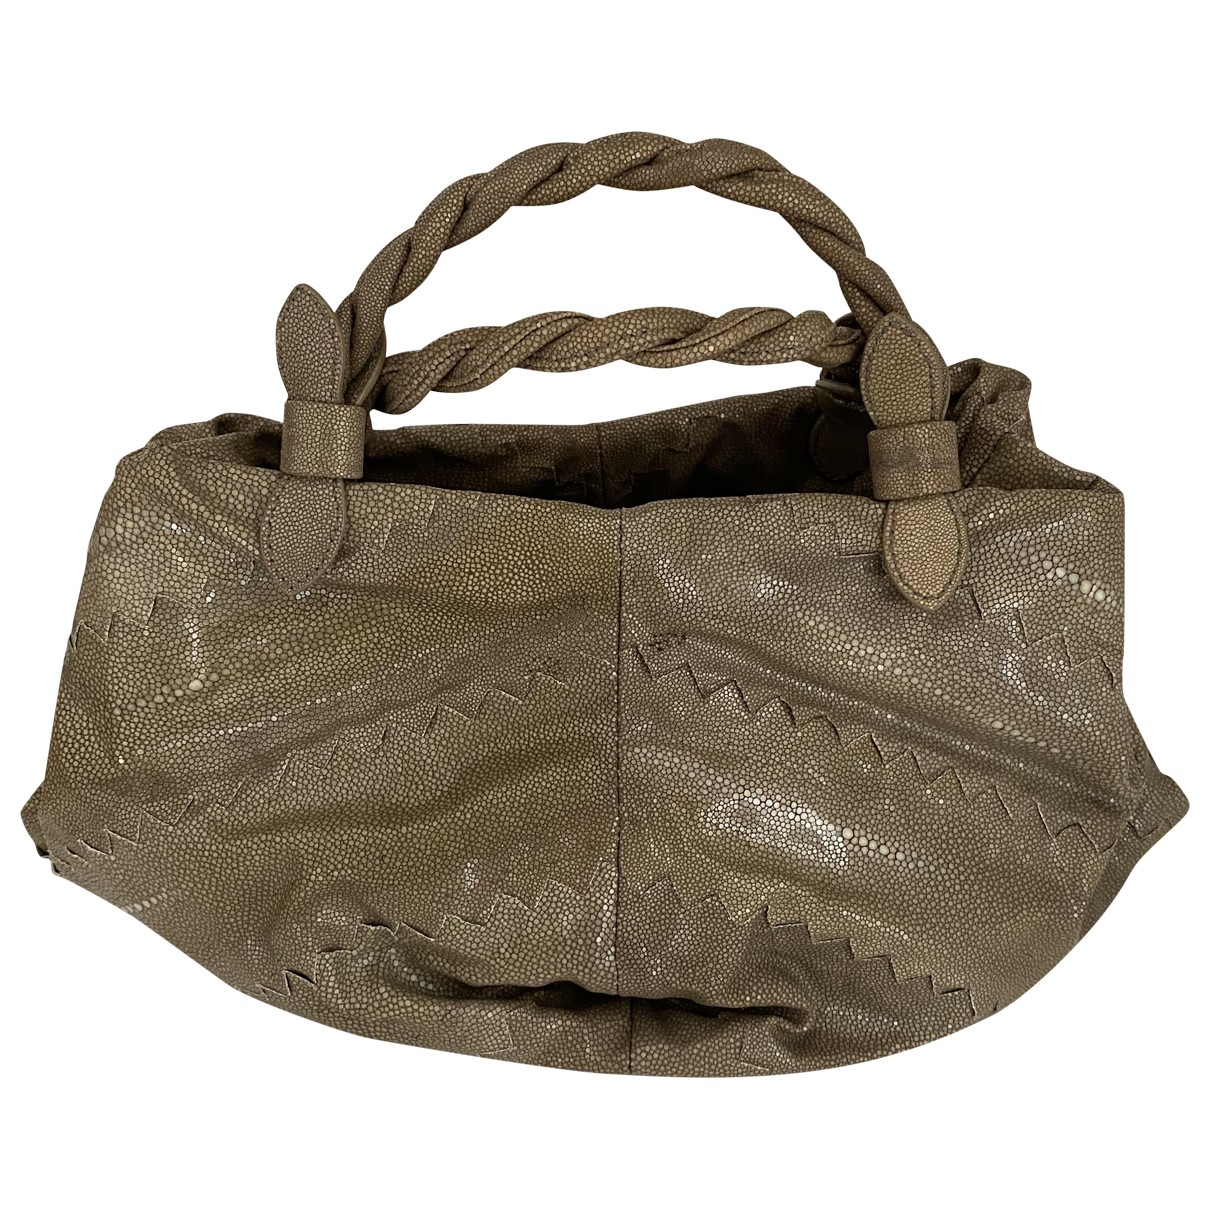 Bottega Veneta \N Handtasche in  Beige Wasserschlangen